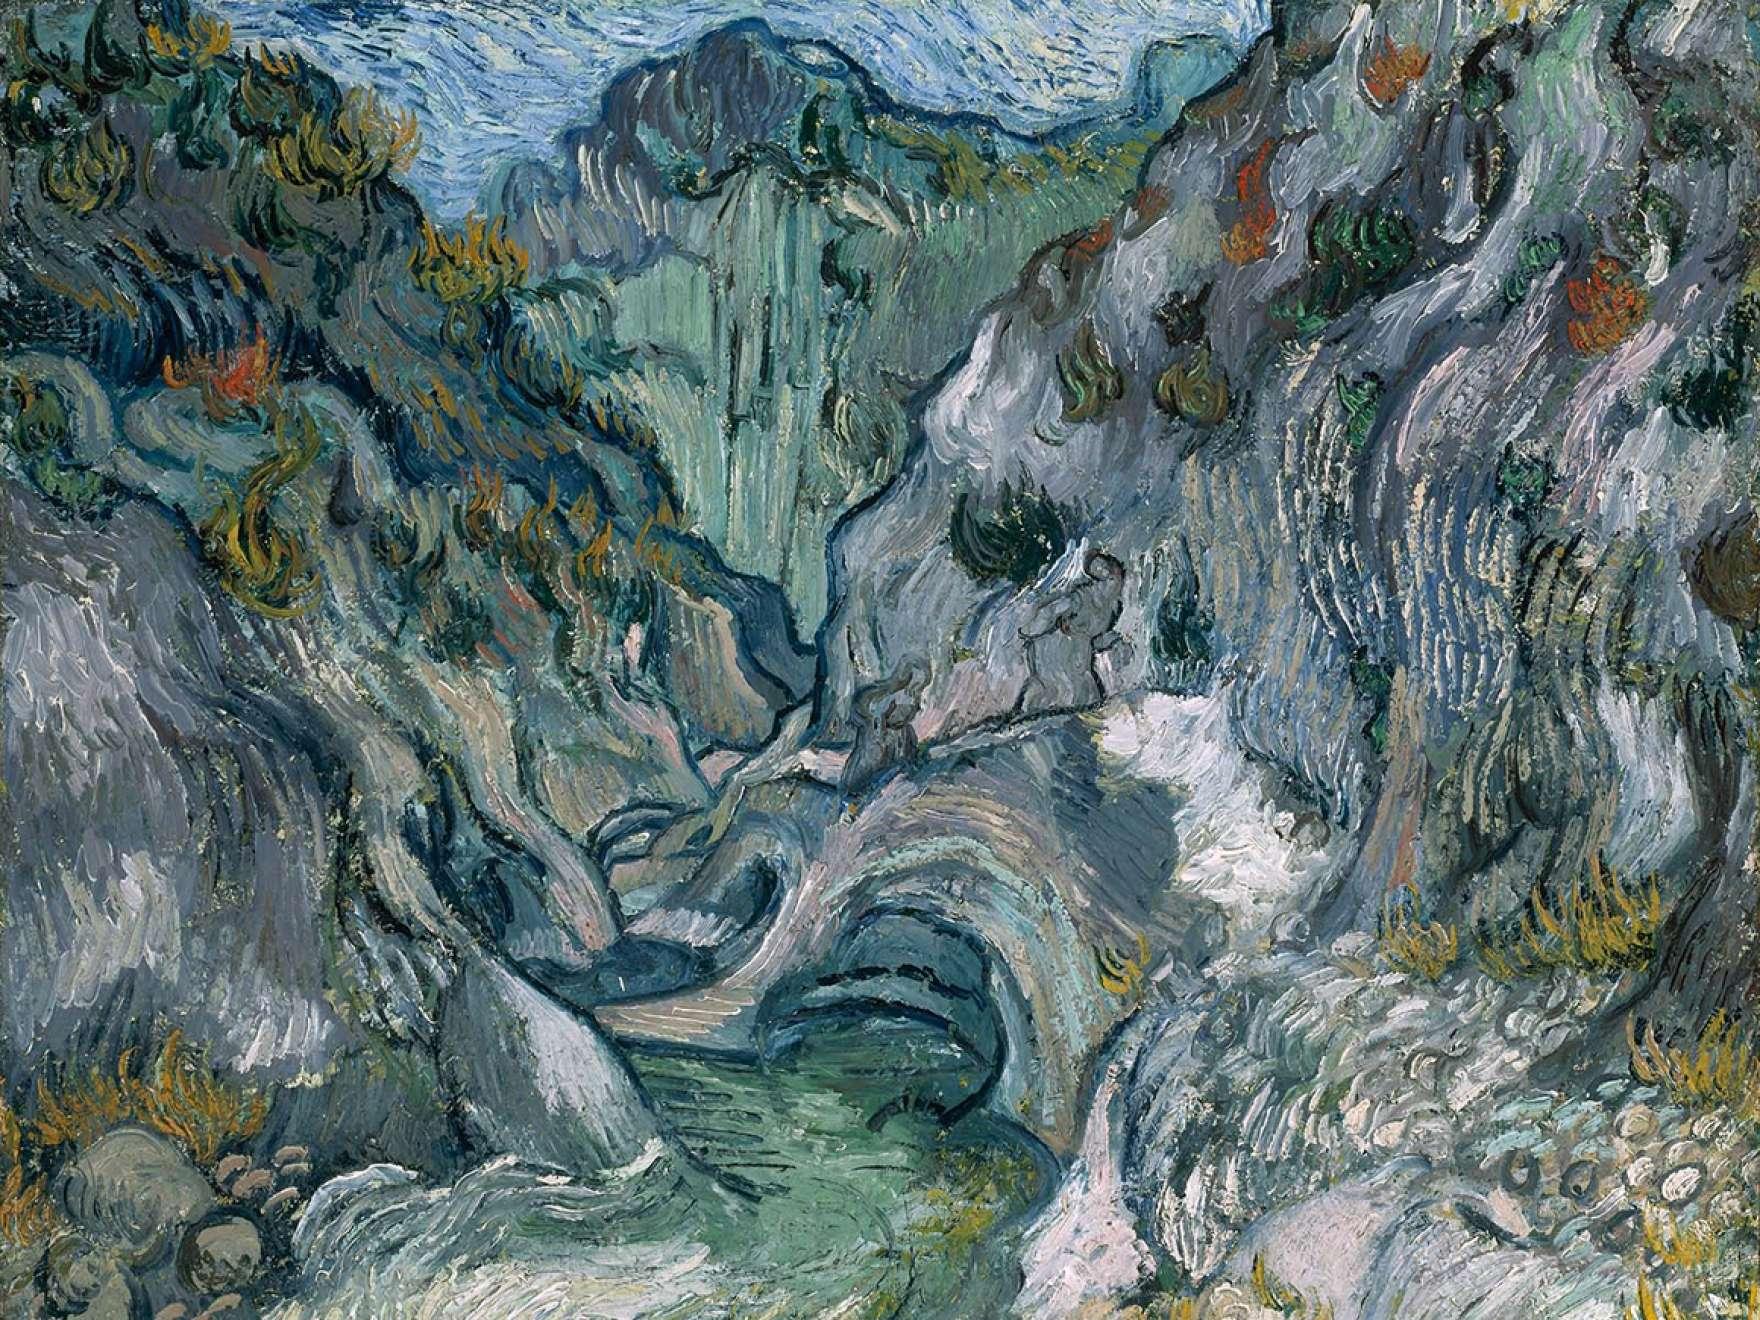 Vincent van Gogh, Ravine, 1889